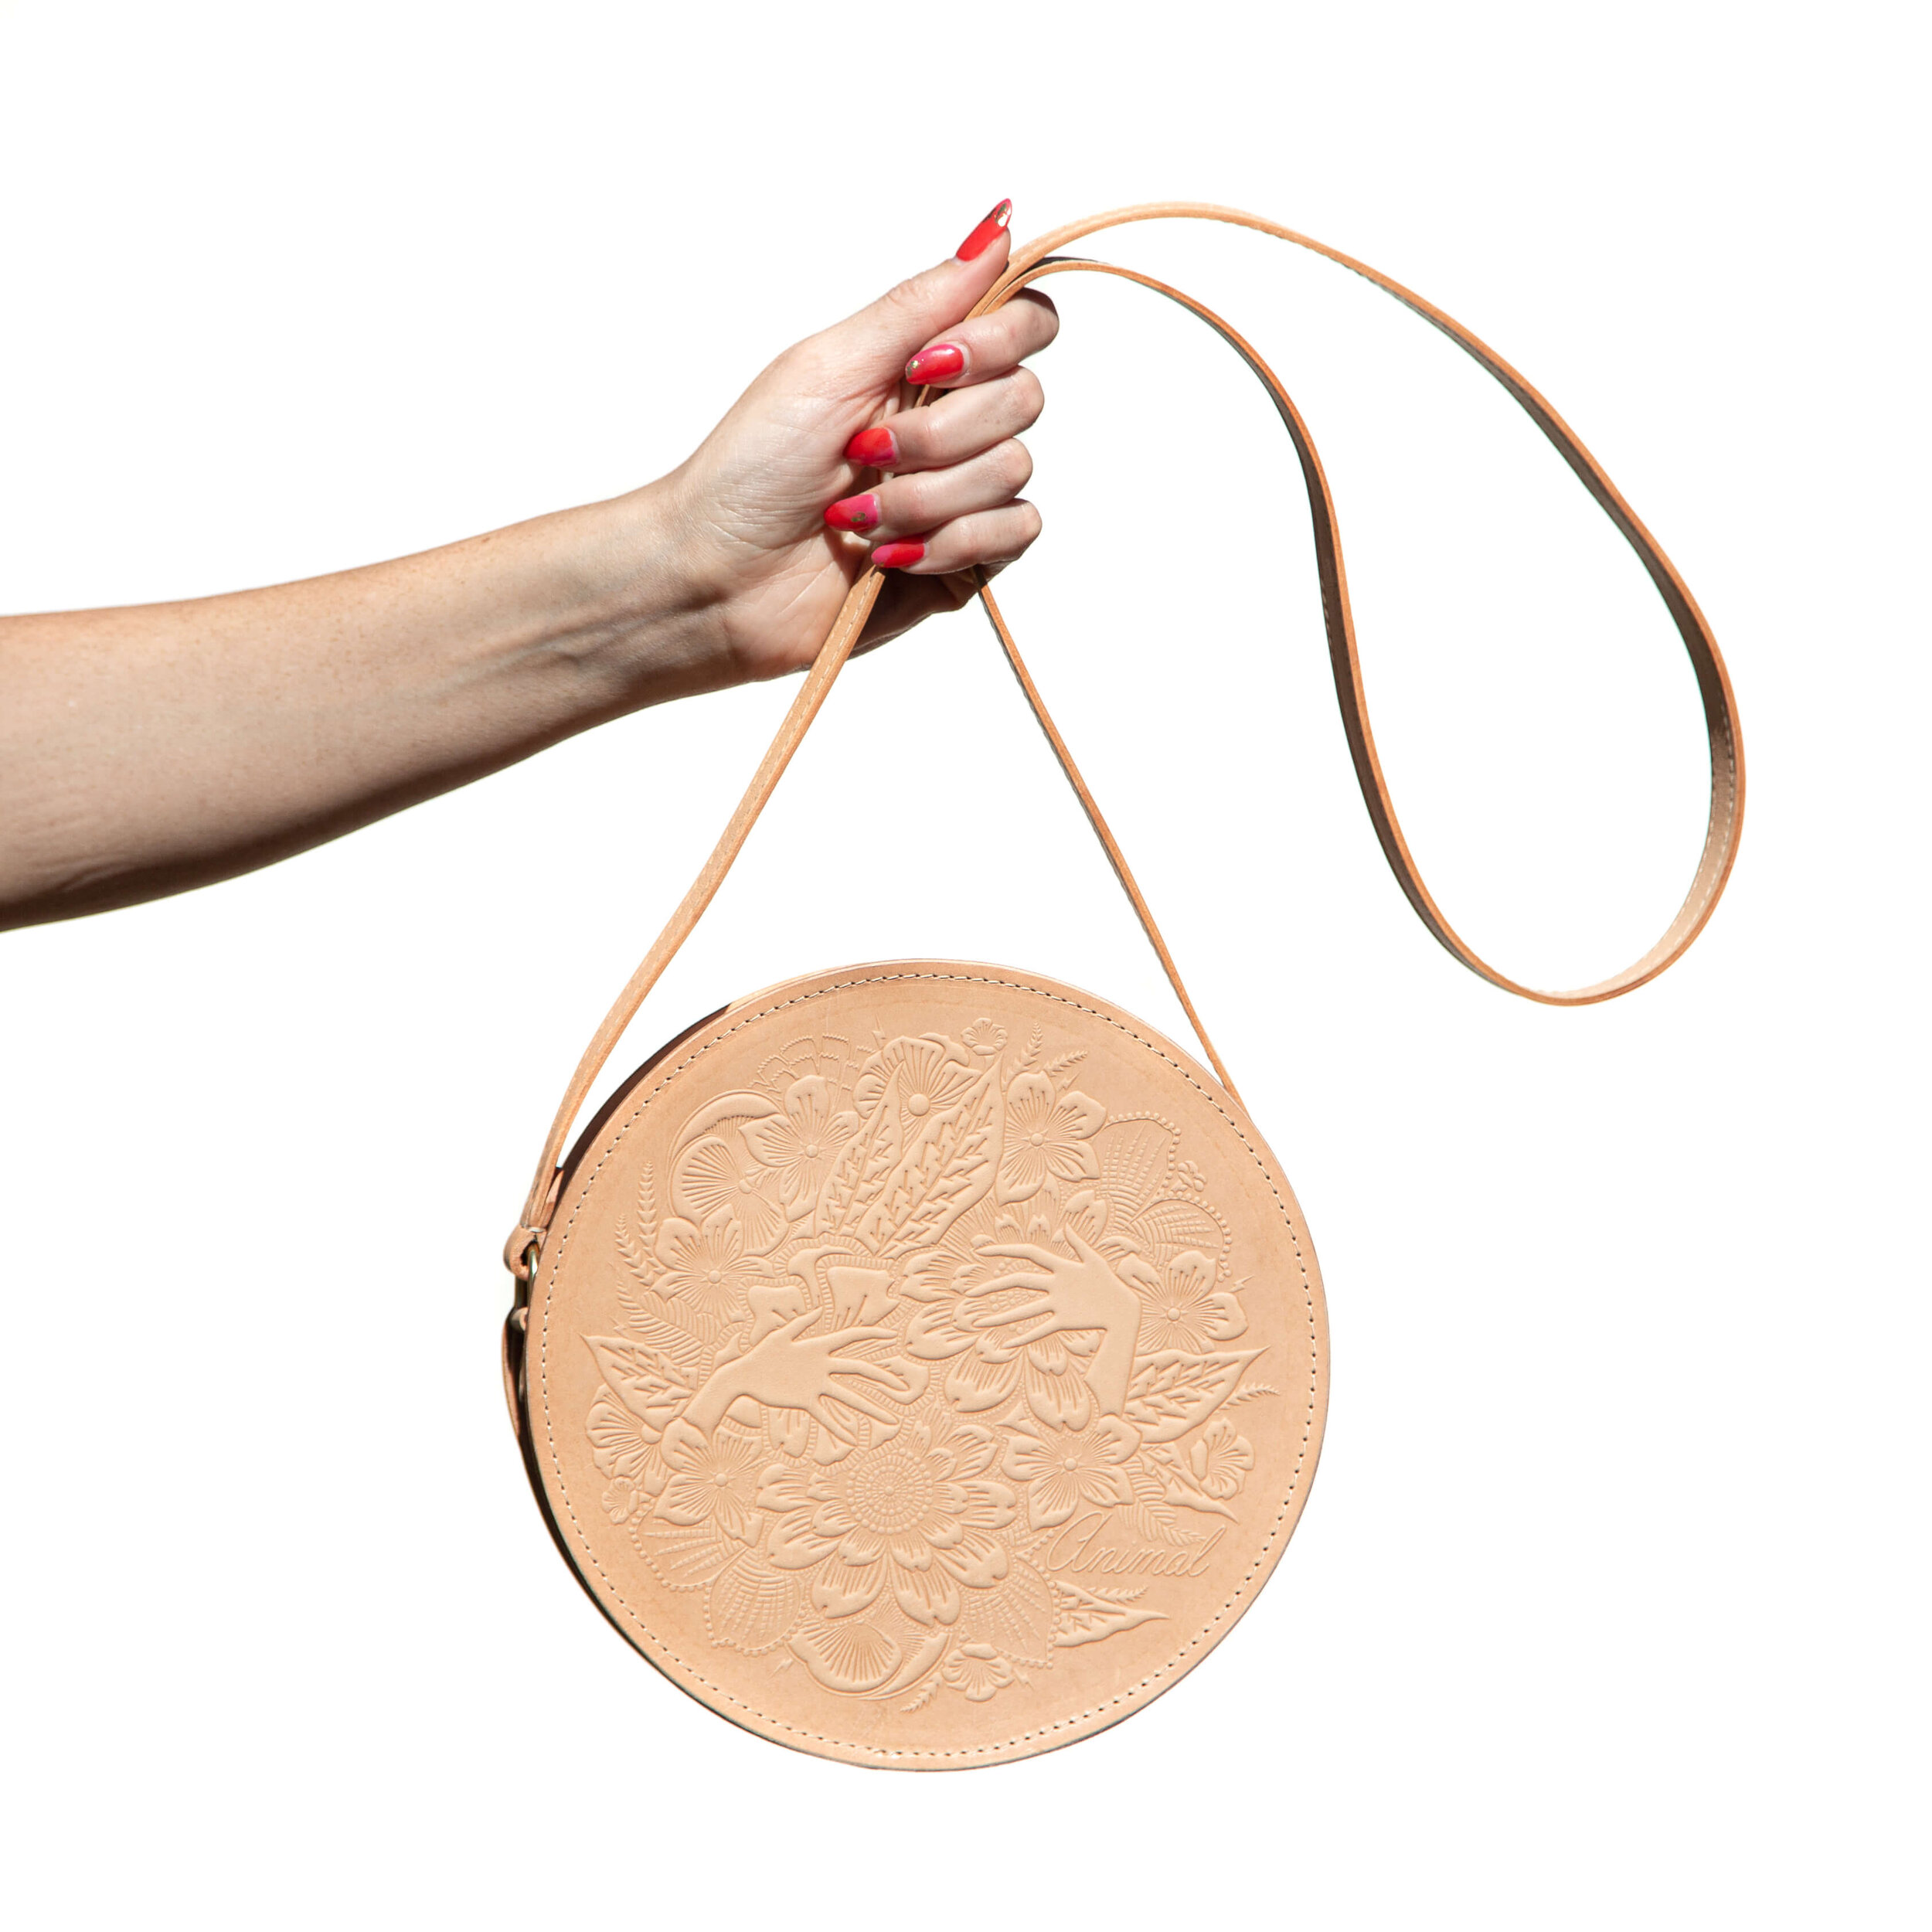 animal-handmade-leather-crossbody-tan-2.jpg